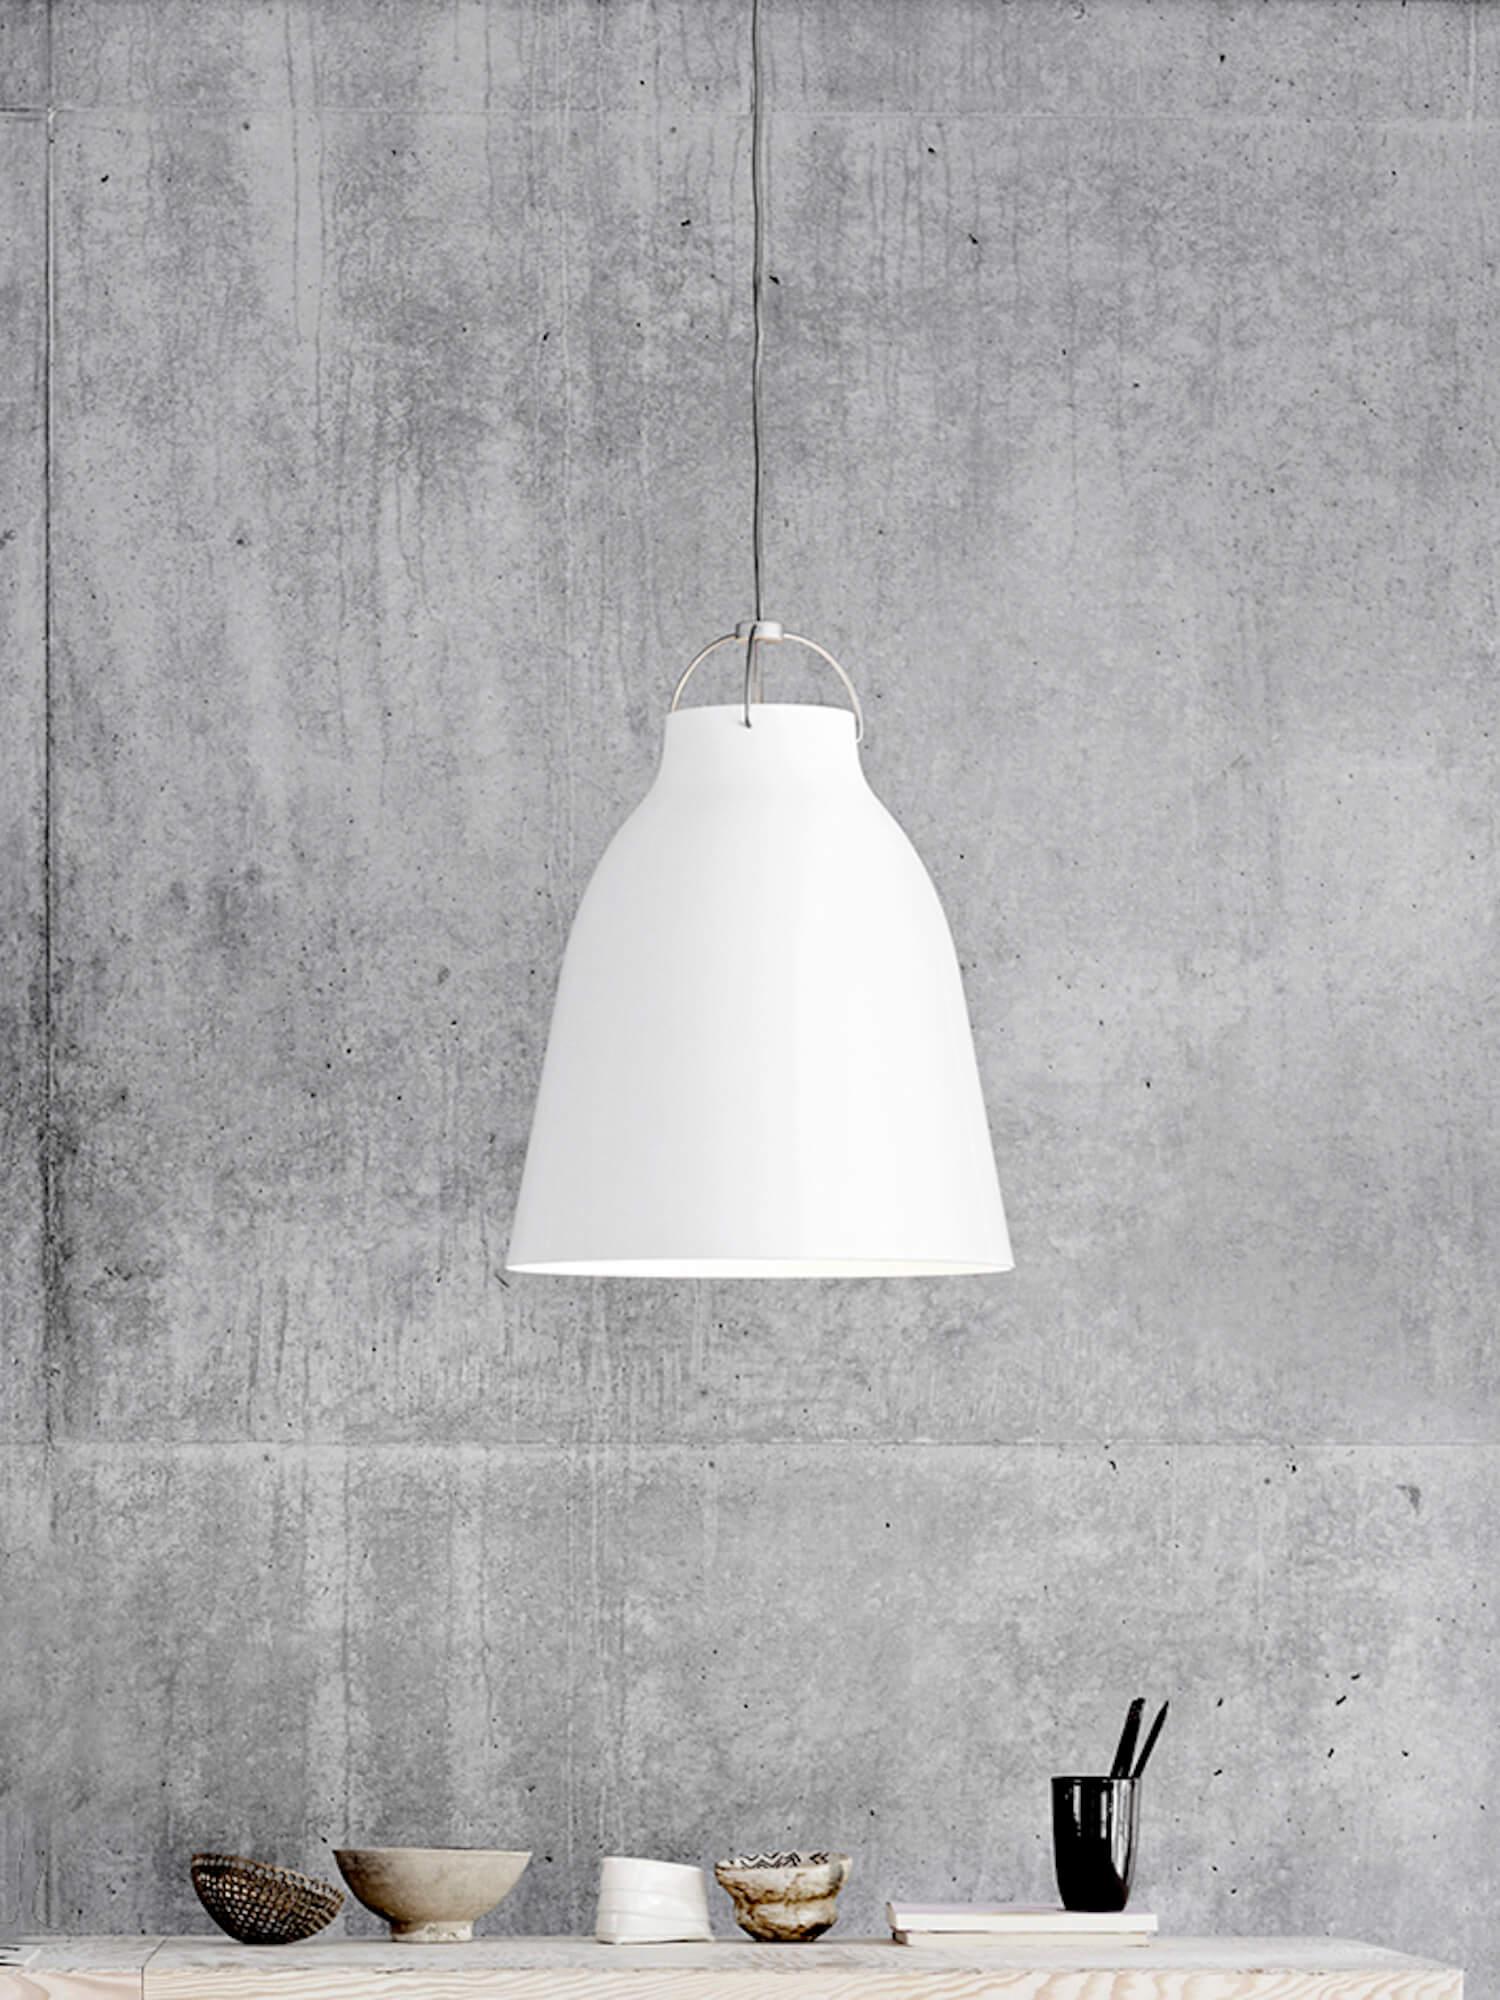 est living maison objet special report Caravaggio P3 White installation 1